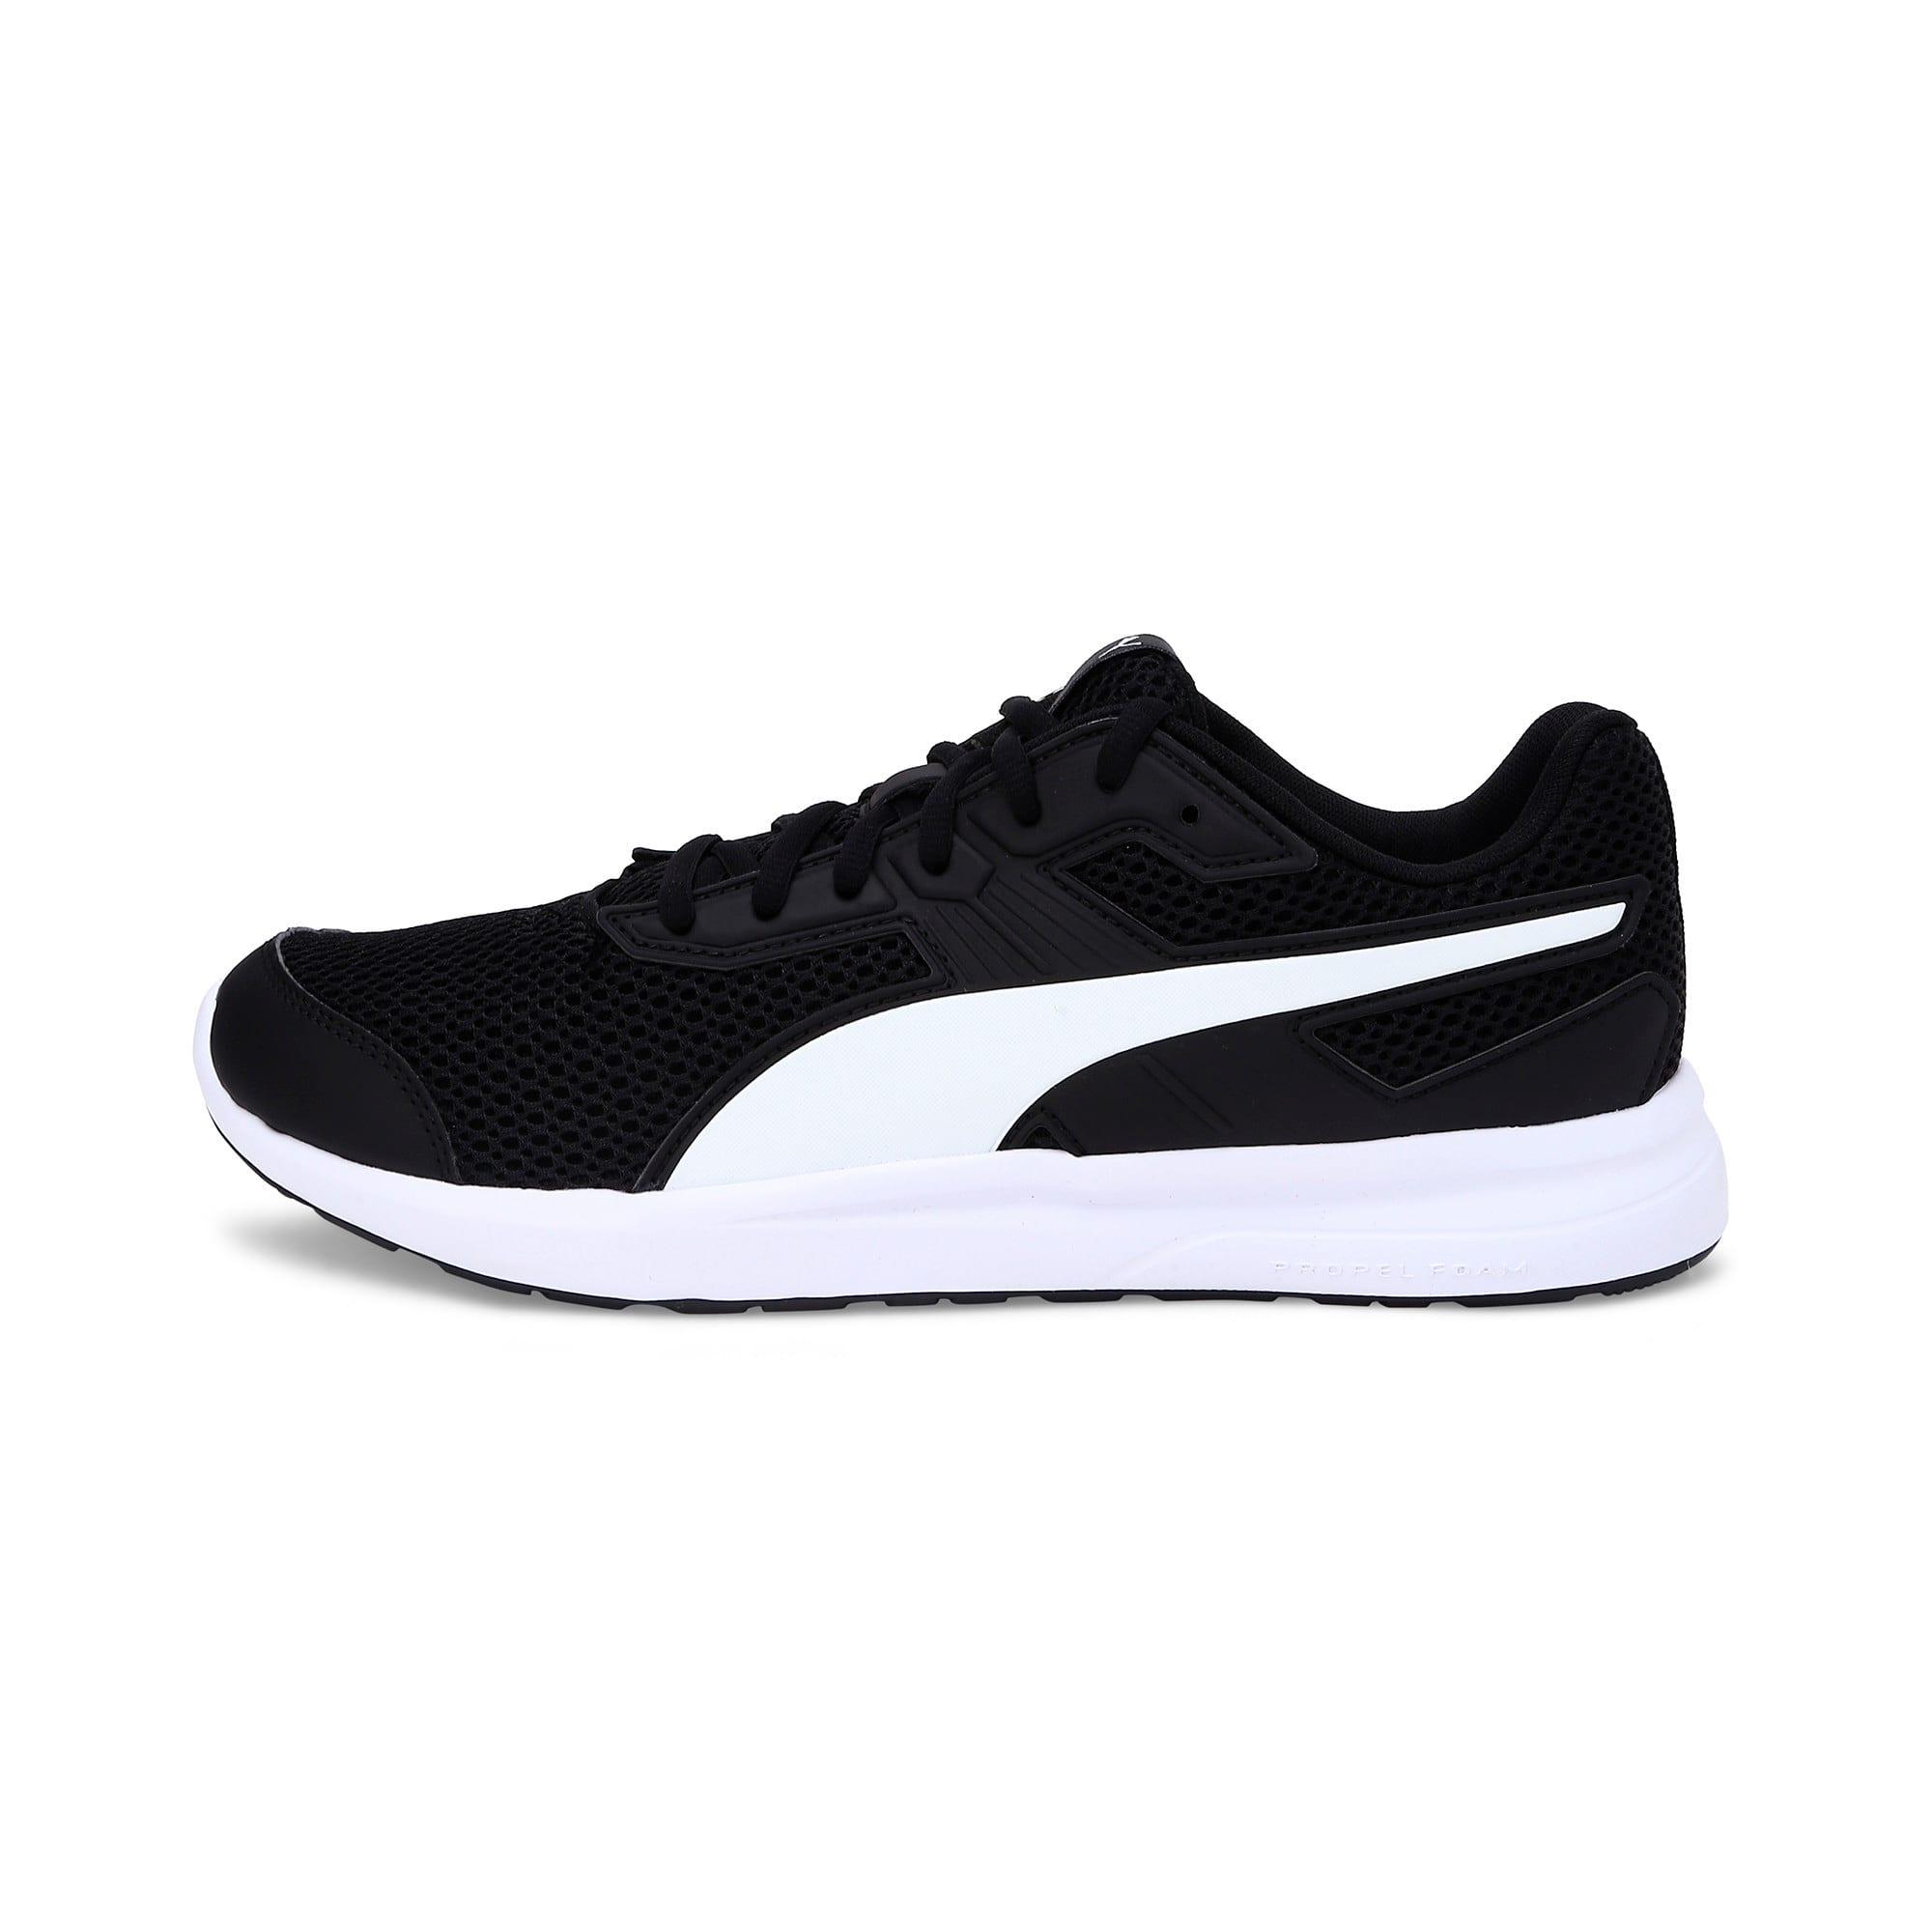 Thumbnail 1 of Escaper Training Shoes, Puma Black-Puma White, medium-IND